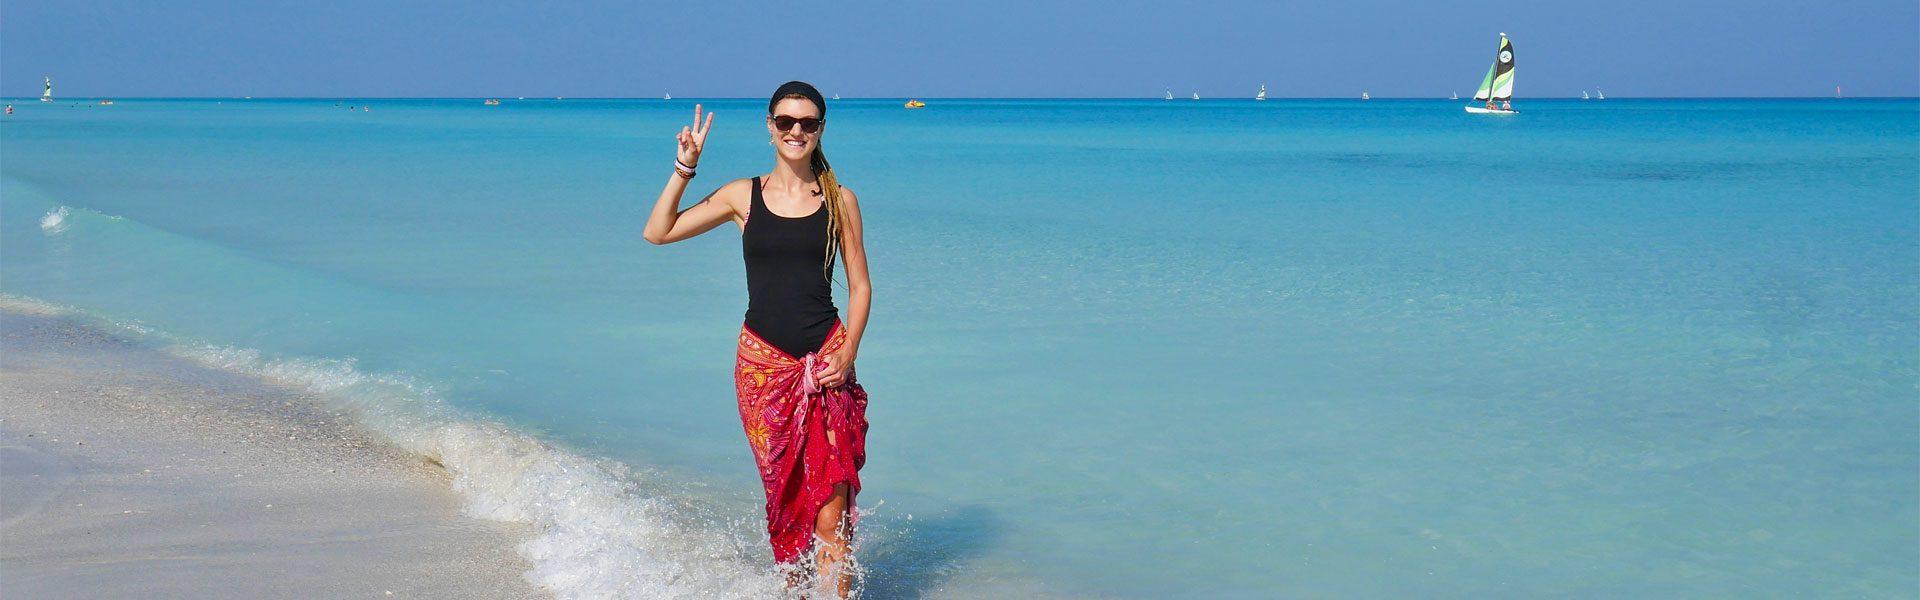 Rasta girl showing peace sign at Varadero beach, Cuba